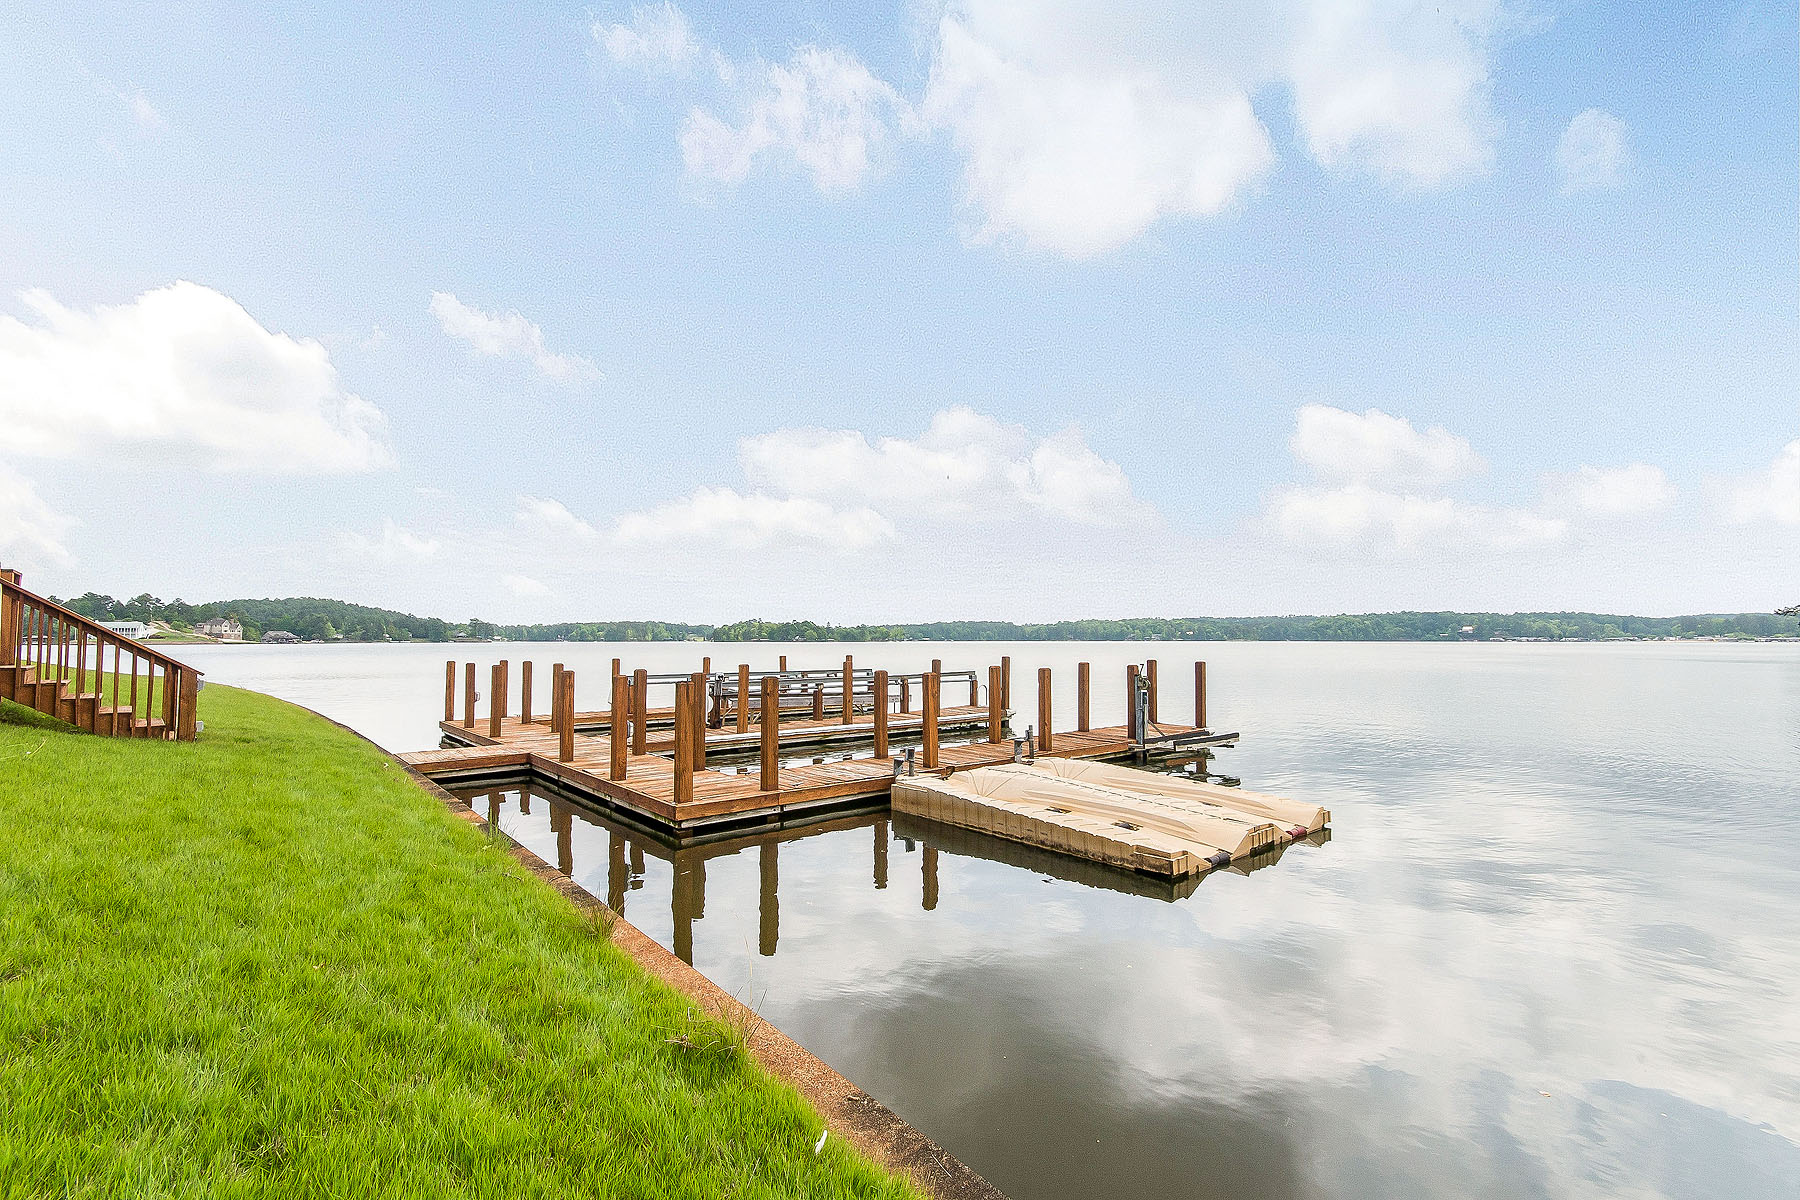 Lake Martin Al Waterfront Homes For Sale Marina Marin 656